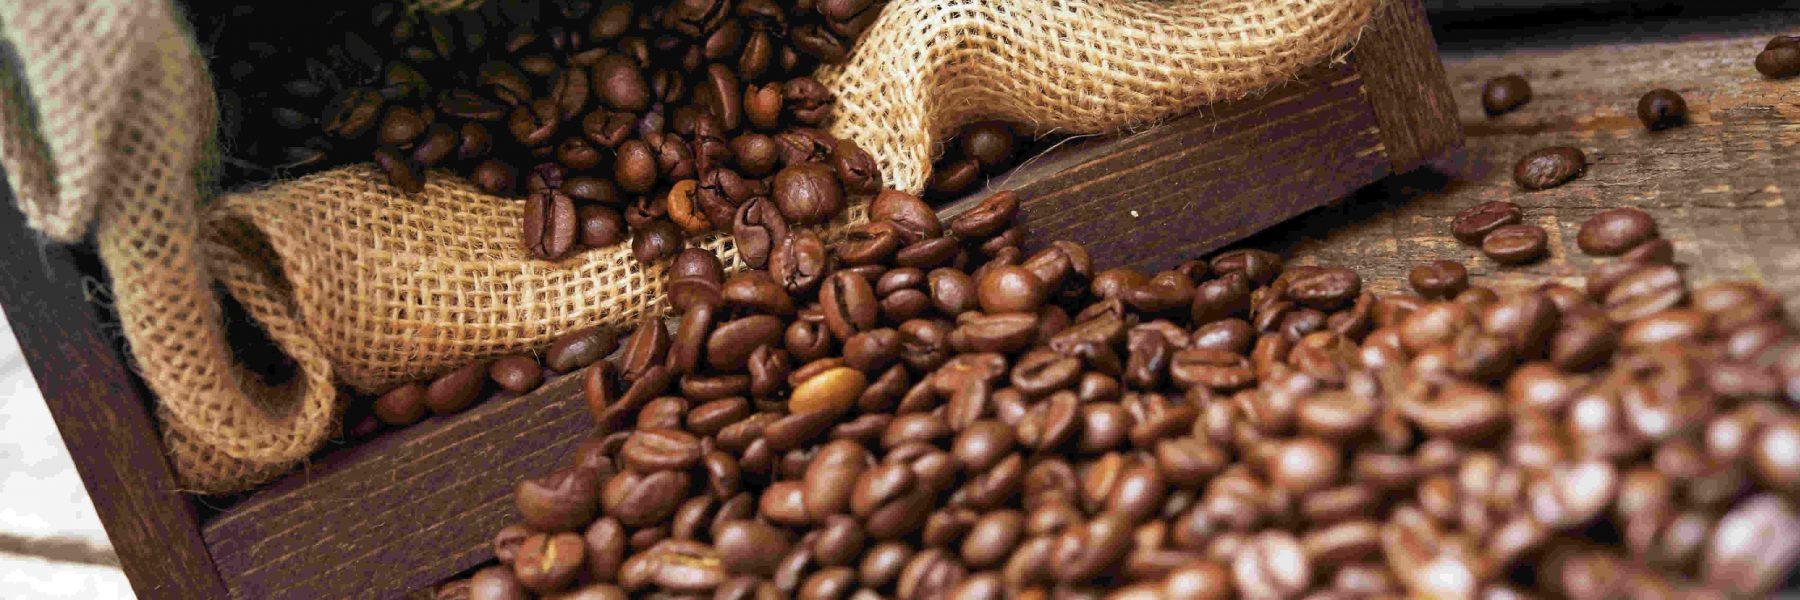 Rainforest Alliance Certified Café range, teas